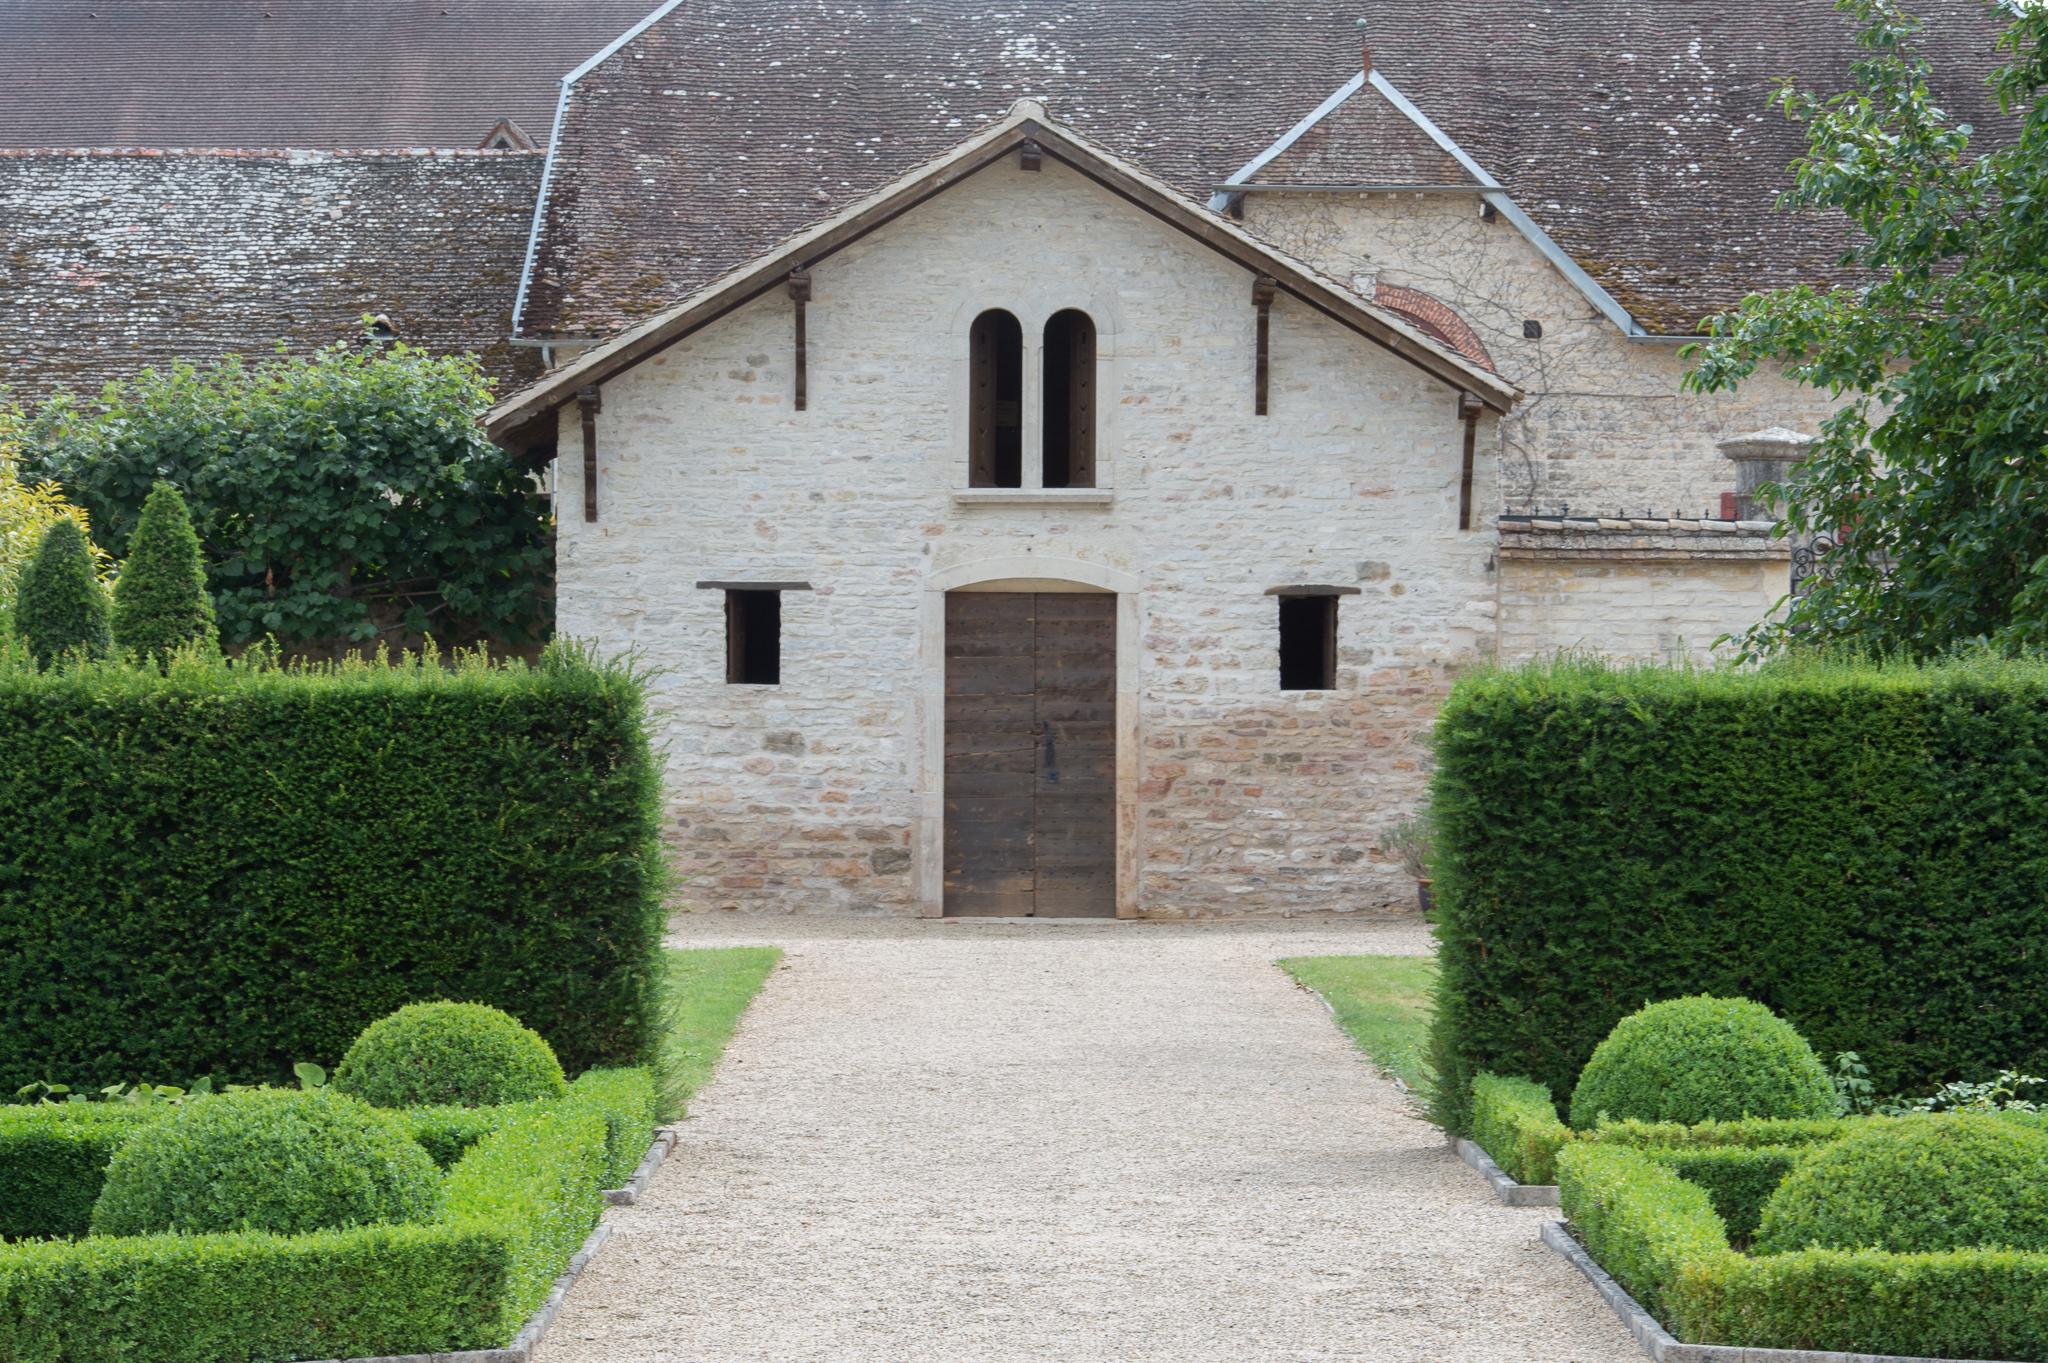 Jason-Davis-Images-Burgundy-0053.jpg